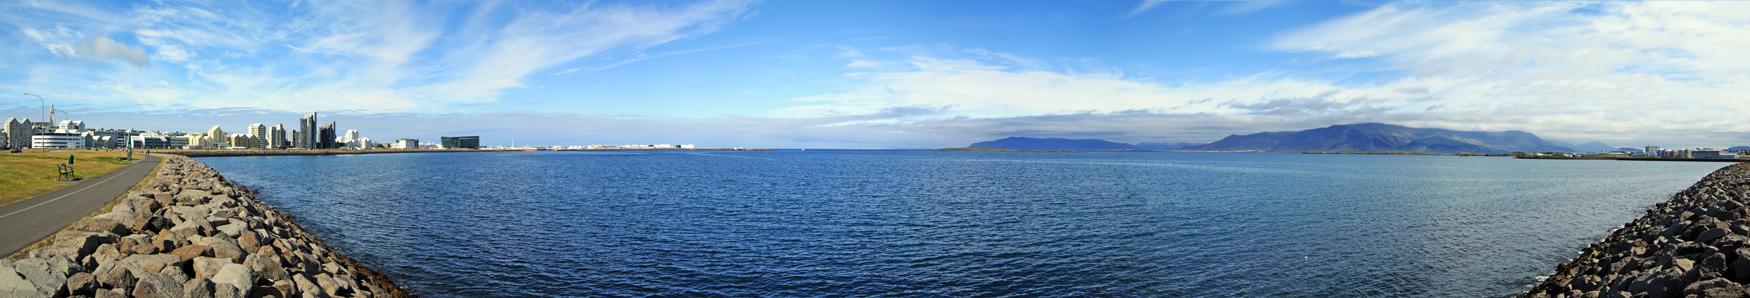 "La ""Baie des fumées"" de Reykjavik (Islande)"